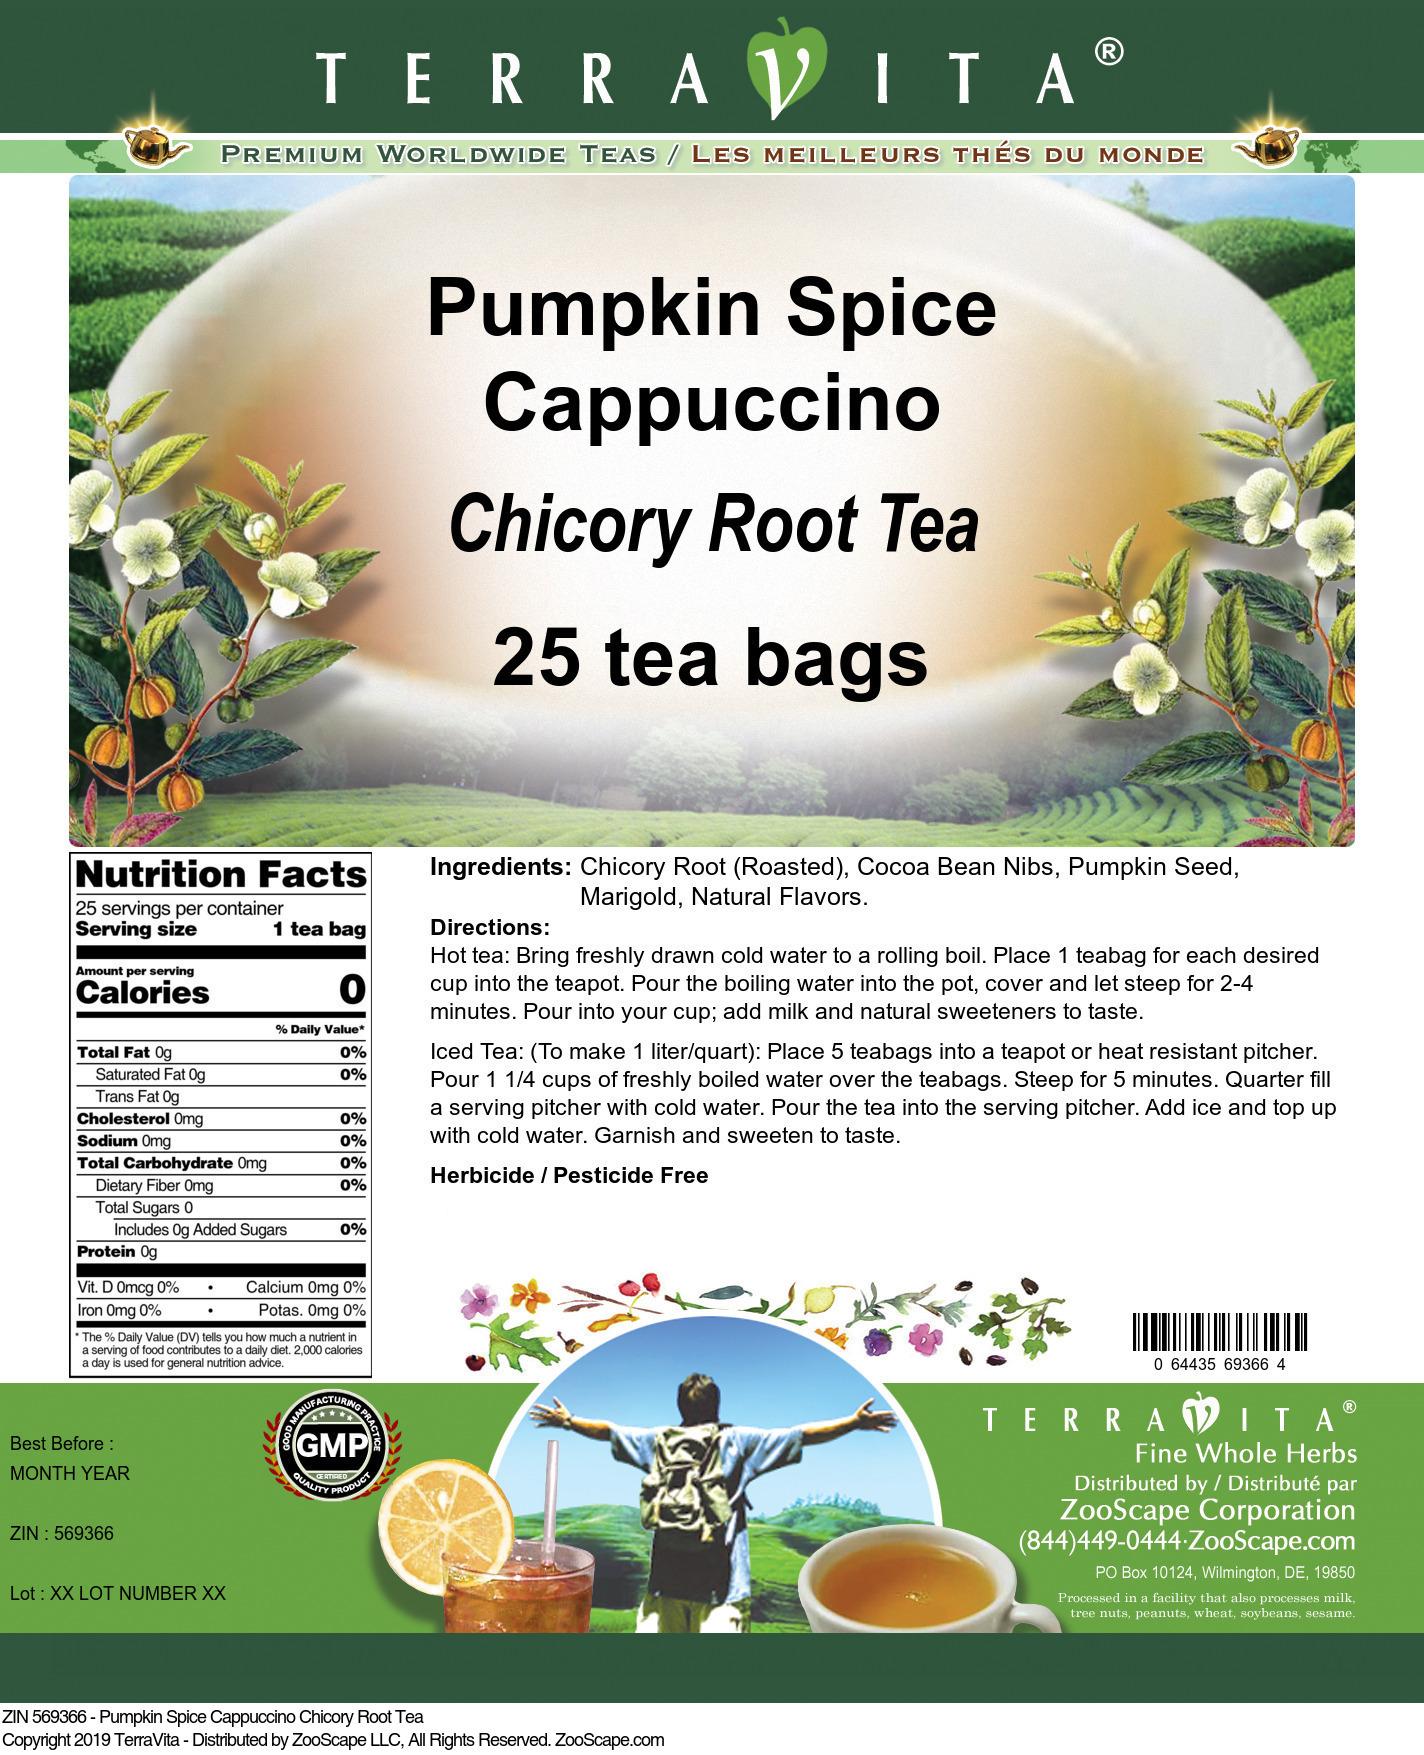 Pumpkin Spice Cappuccino Chicory Root Tea